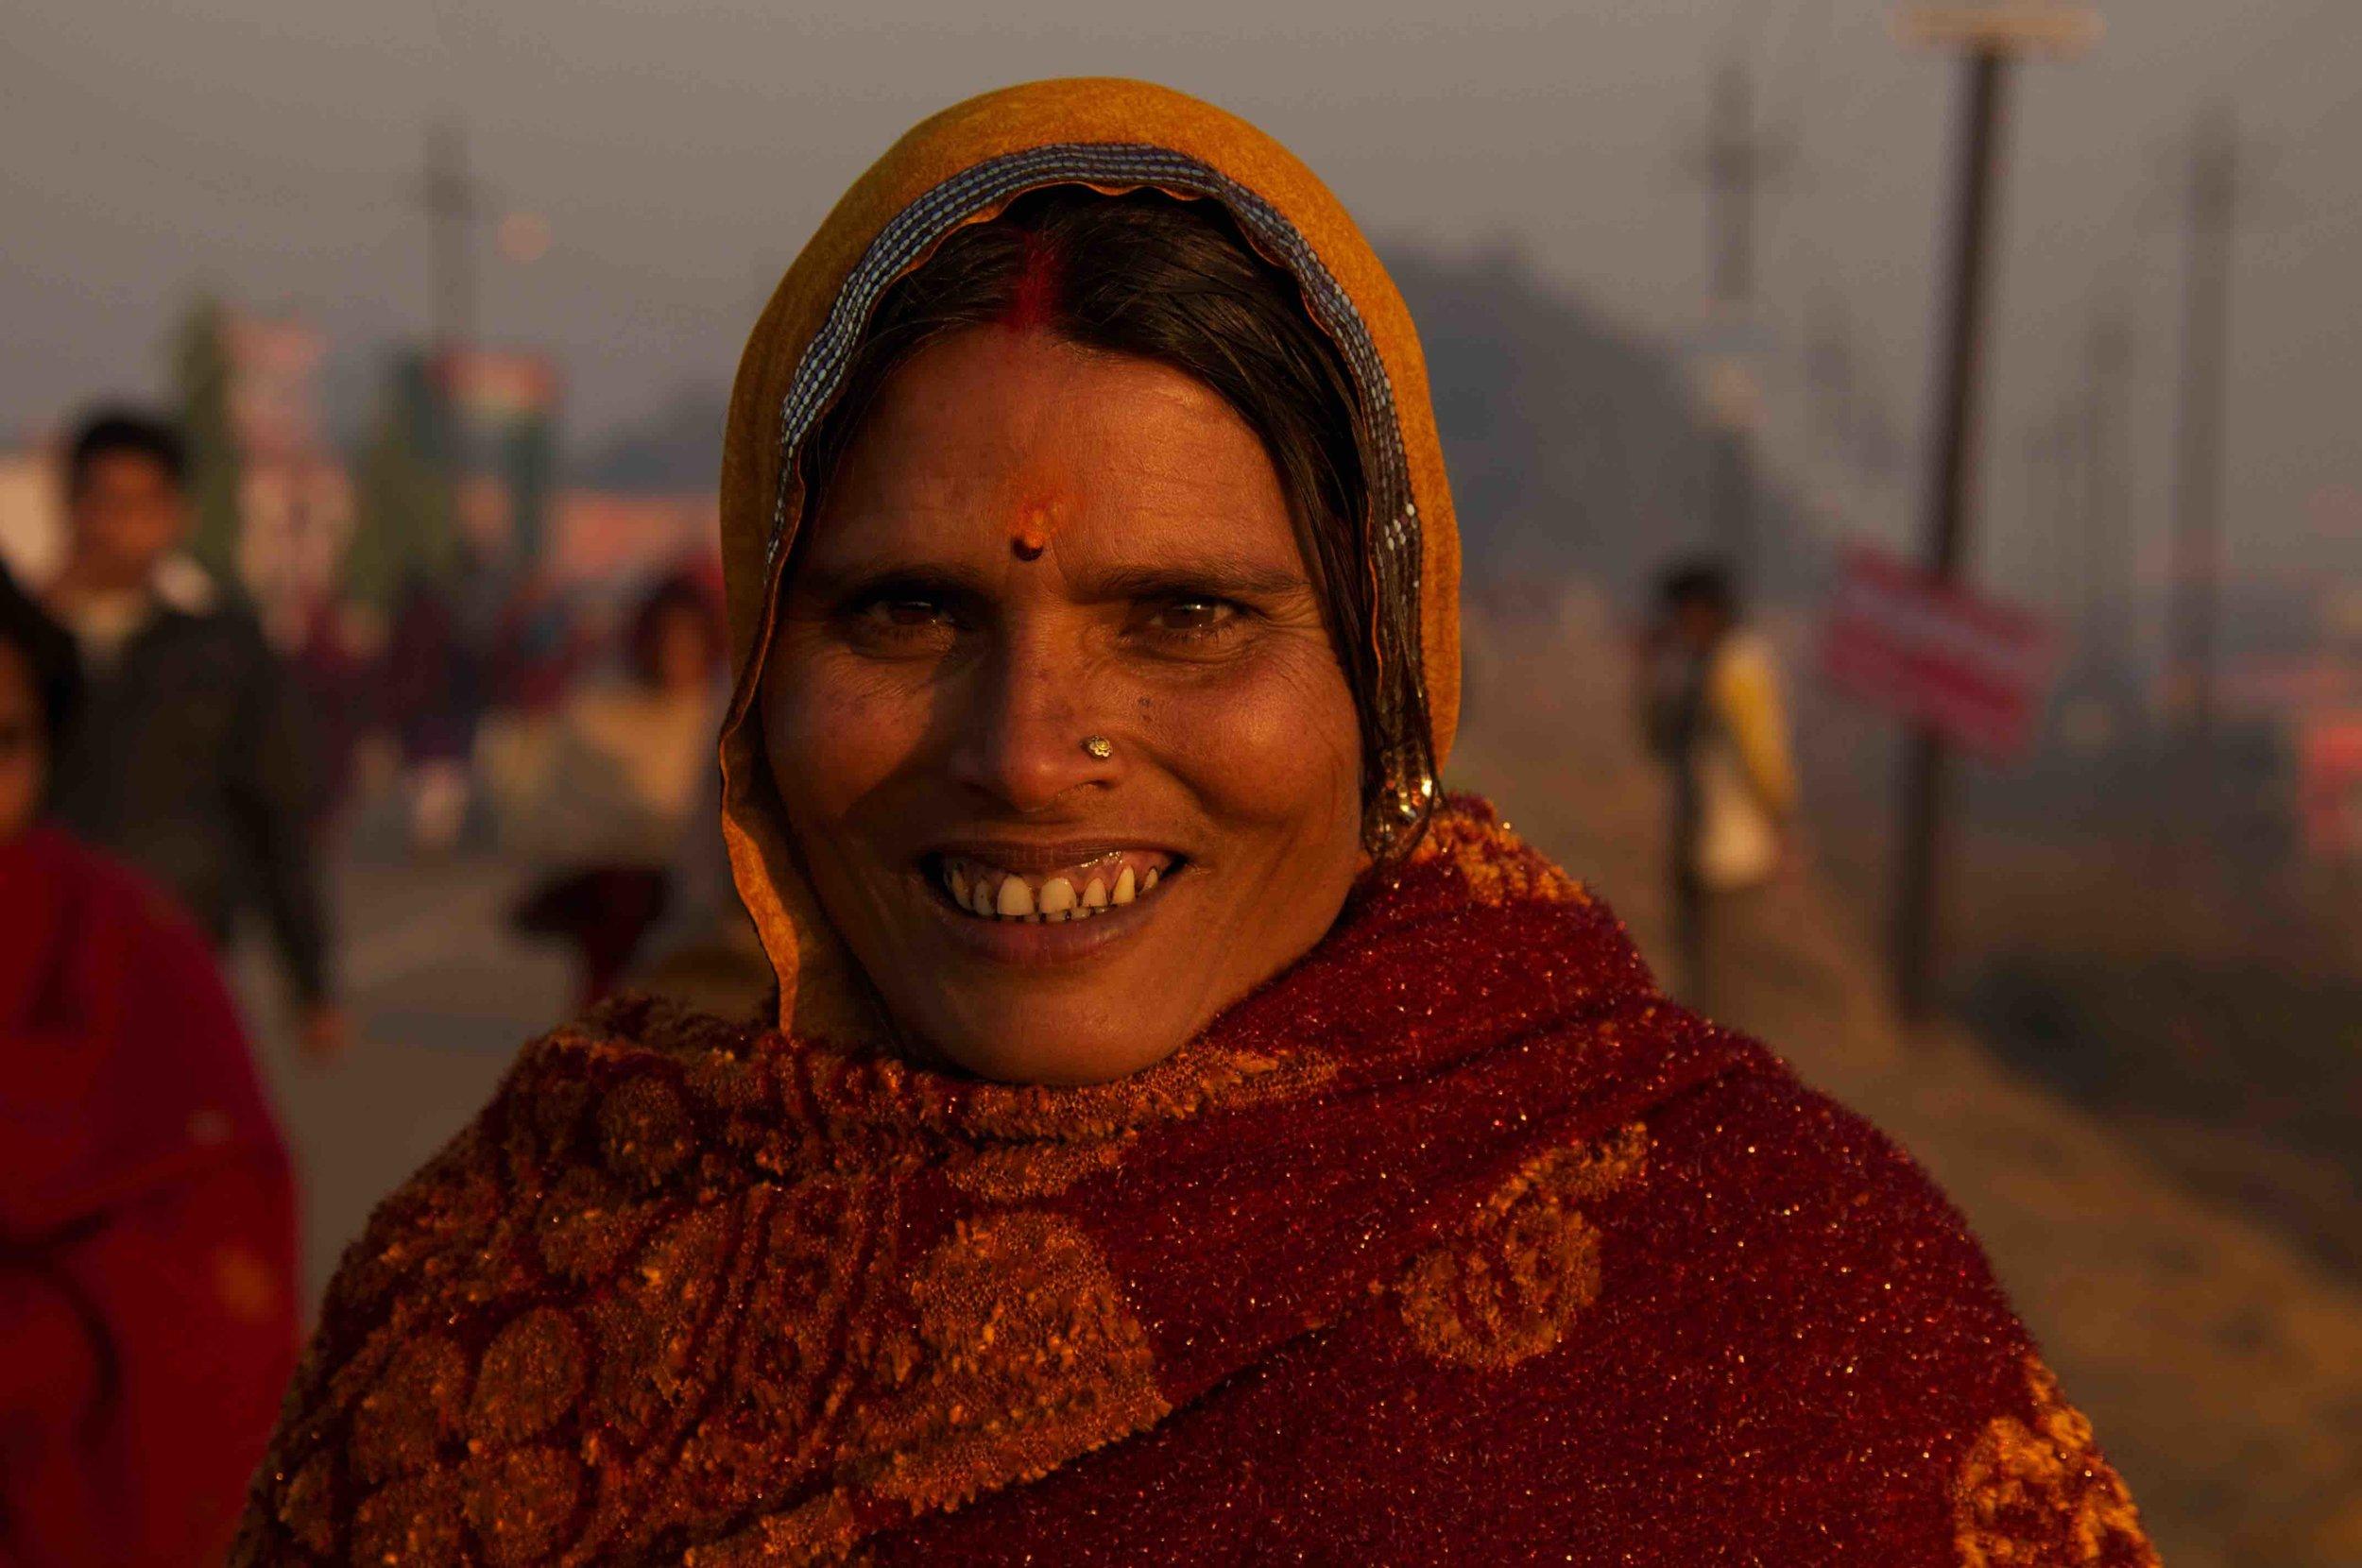 Yolanda-French-Yogalanda-Kumbh-Mela-Pilgrim-Woman.jpg